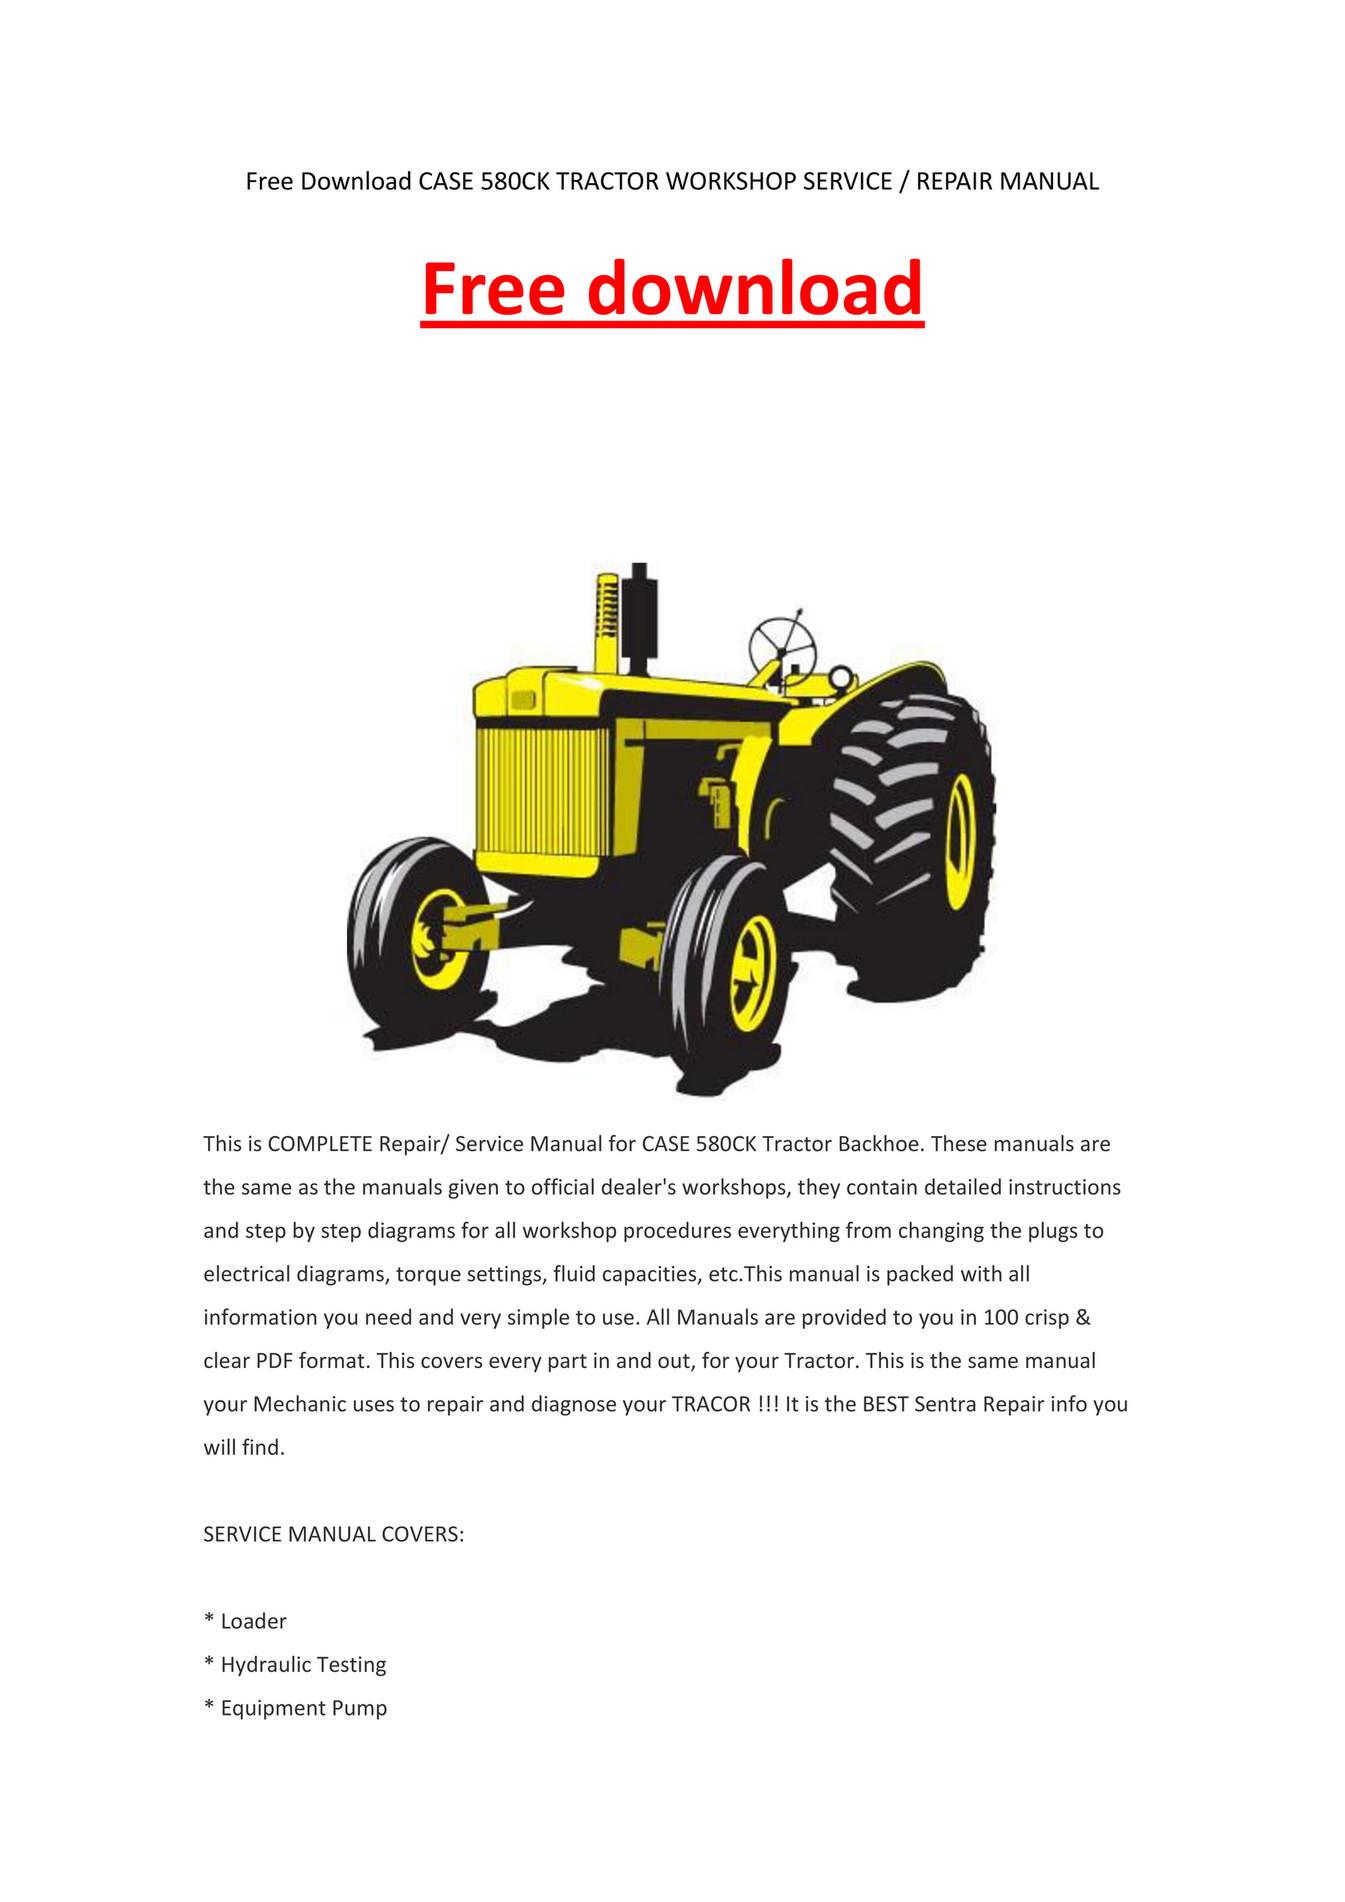 Case 580ck tractor workshop service repair manual by kevinlee.